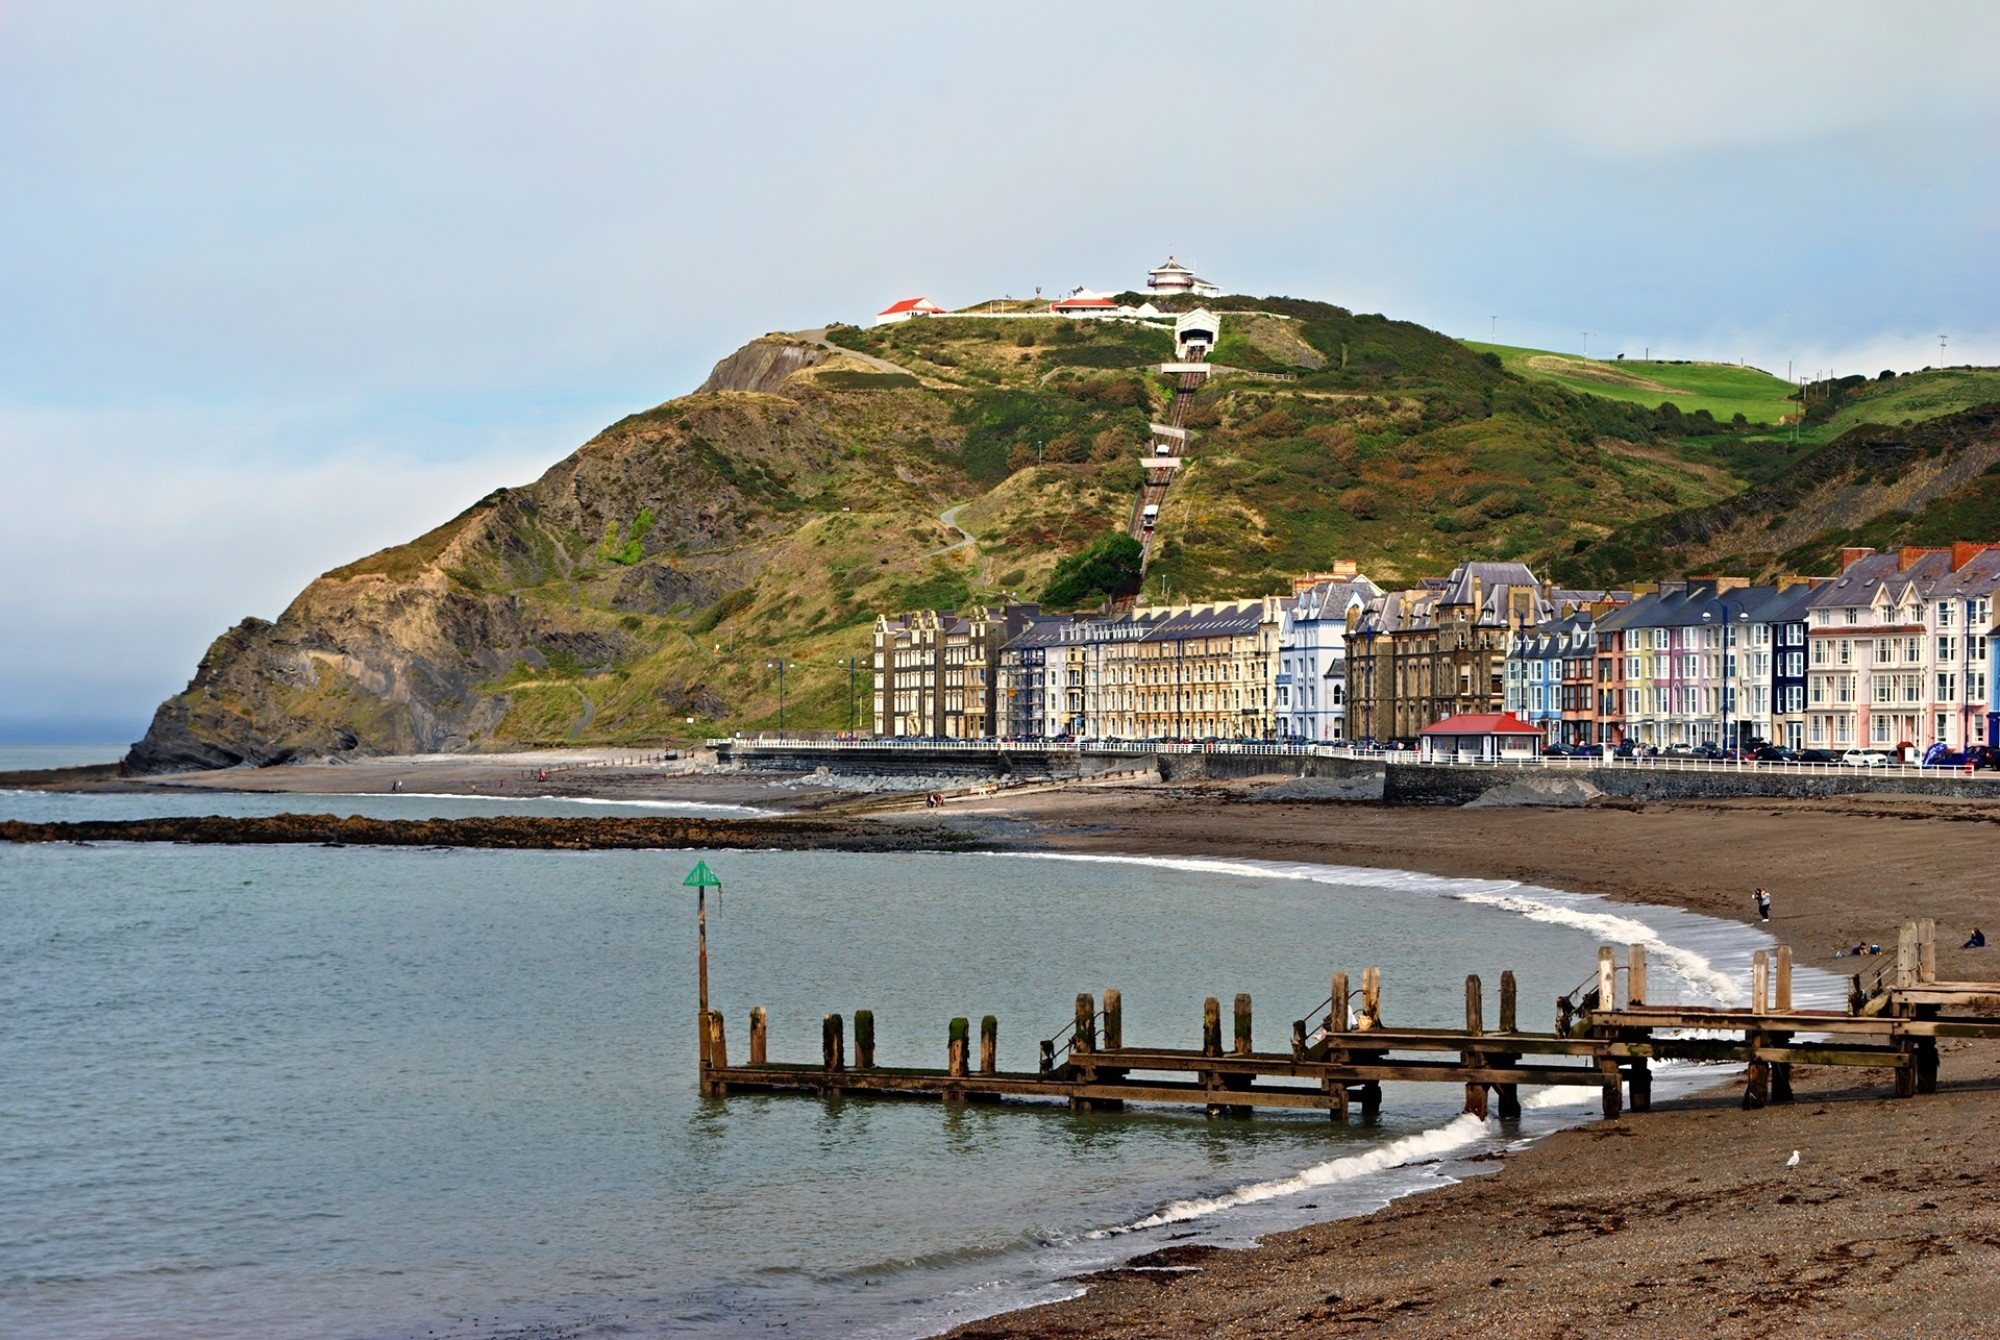 Colourful-buildings-by-North-Beach-Aberystwyth